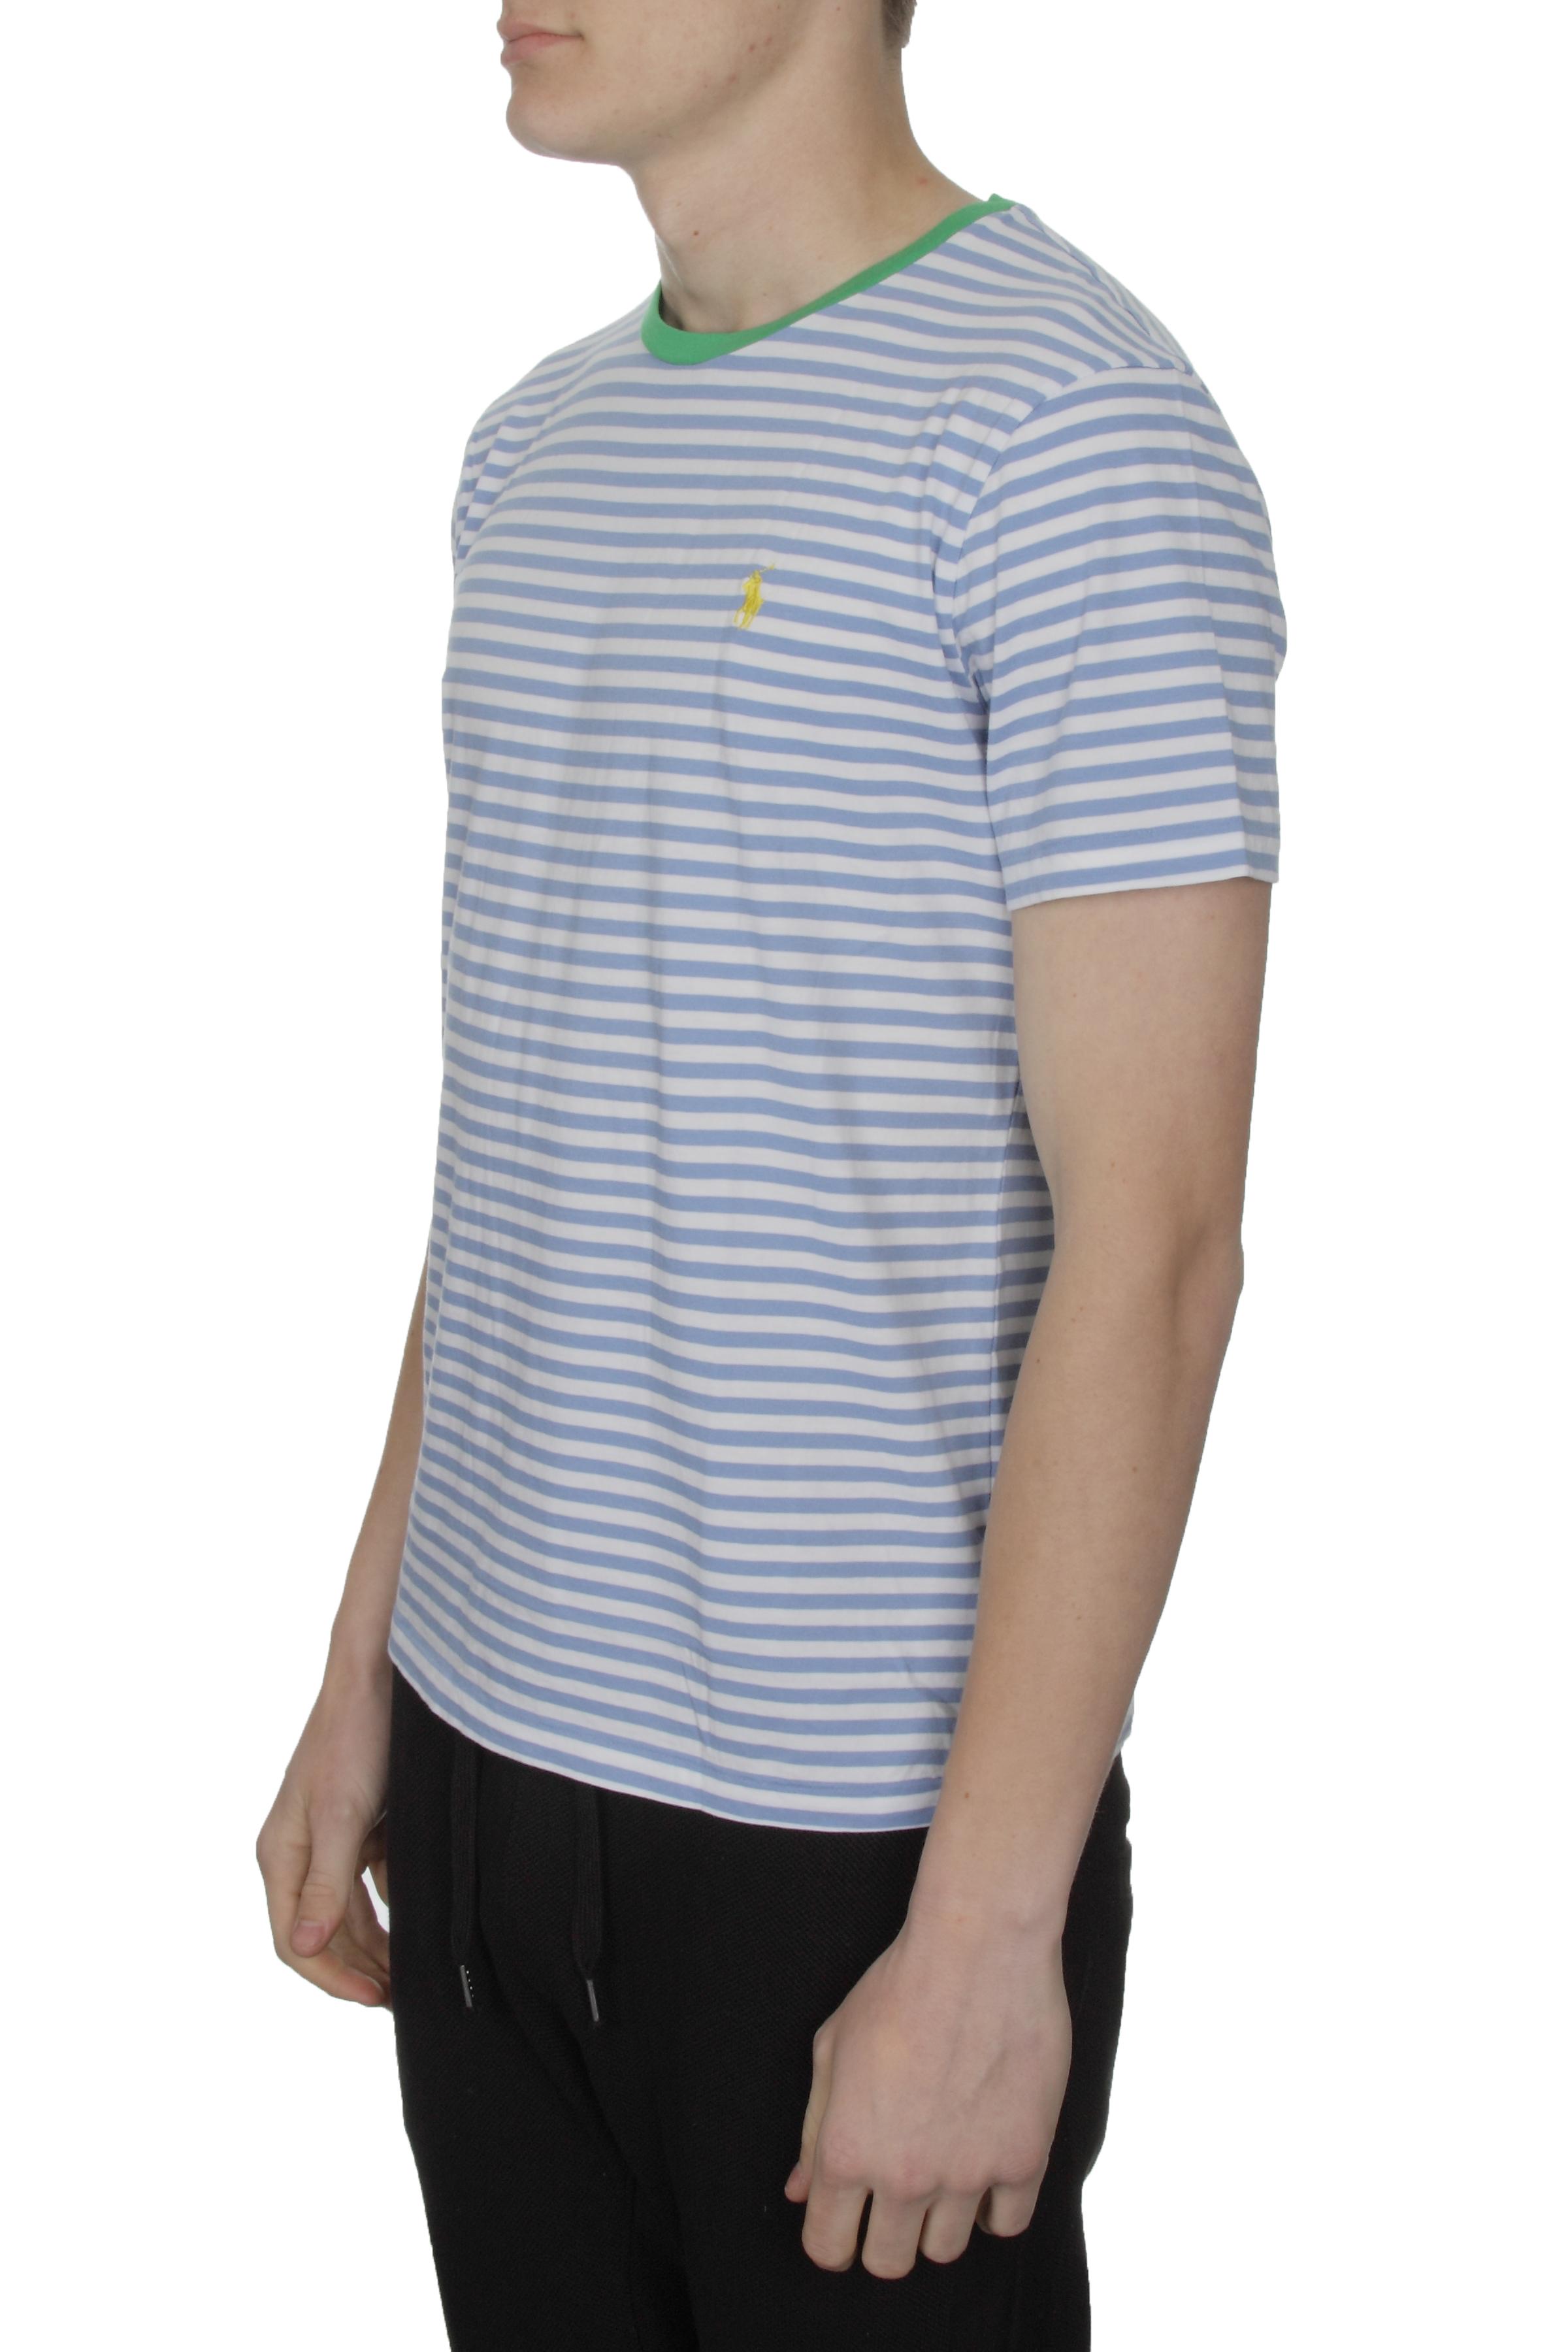 Polo Ralph Lauren Mens Striped T Shirt Regular Fit With